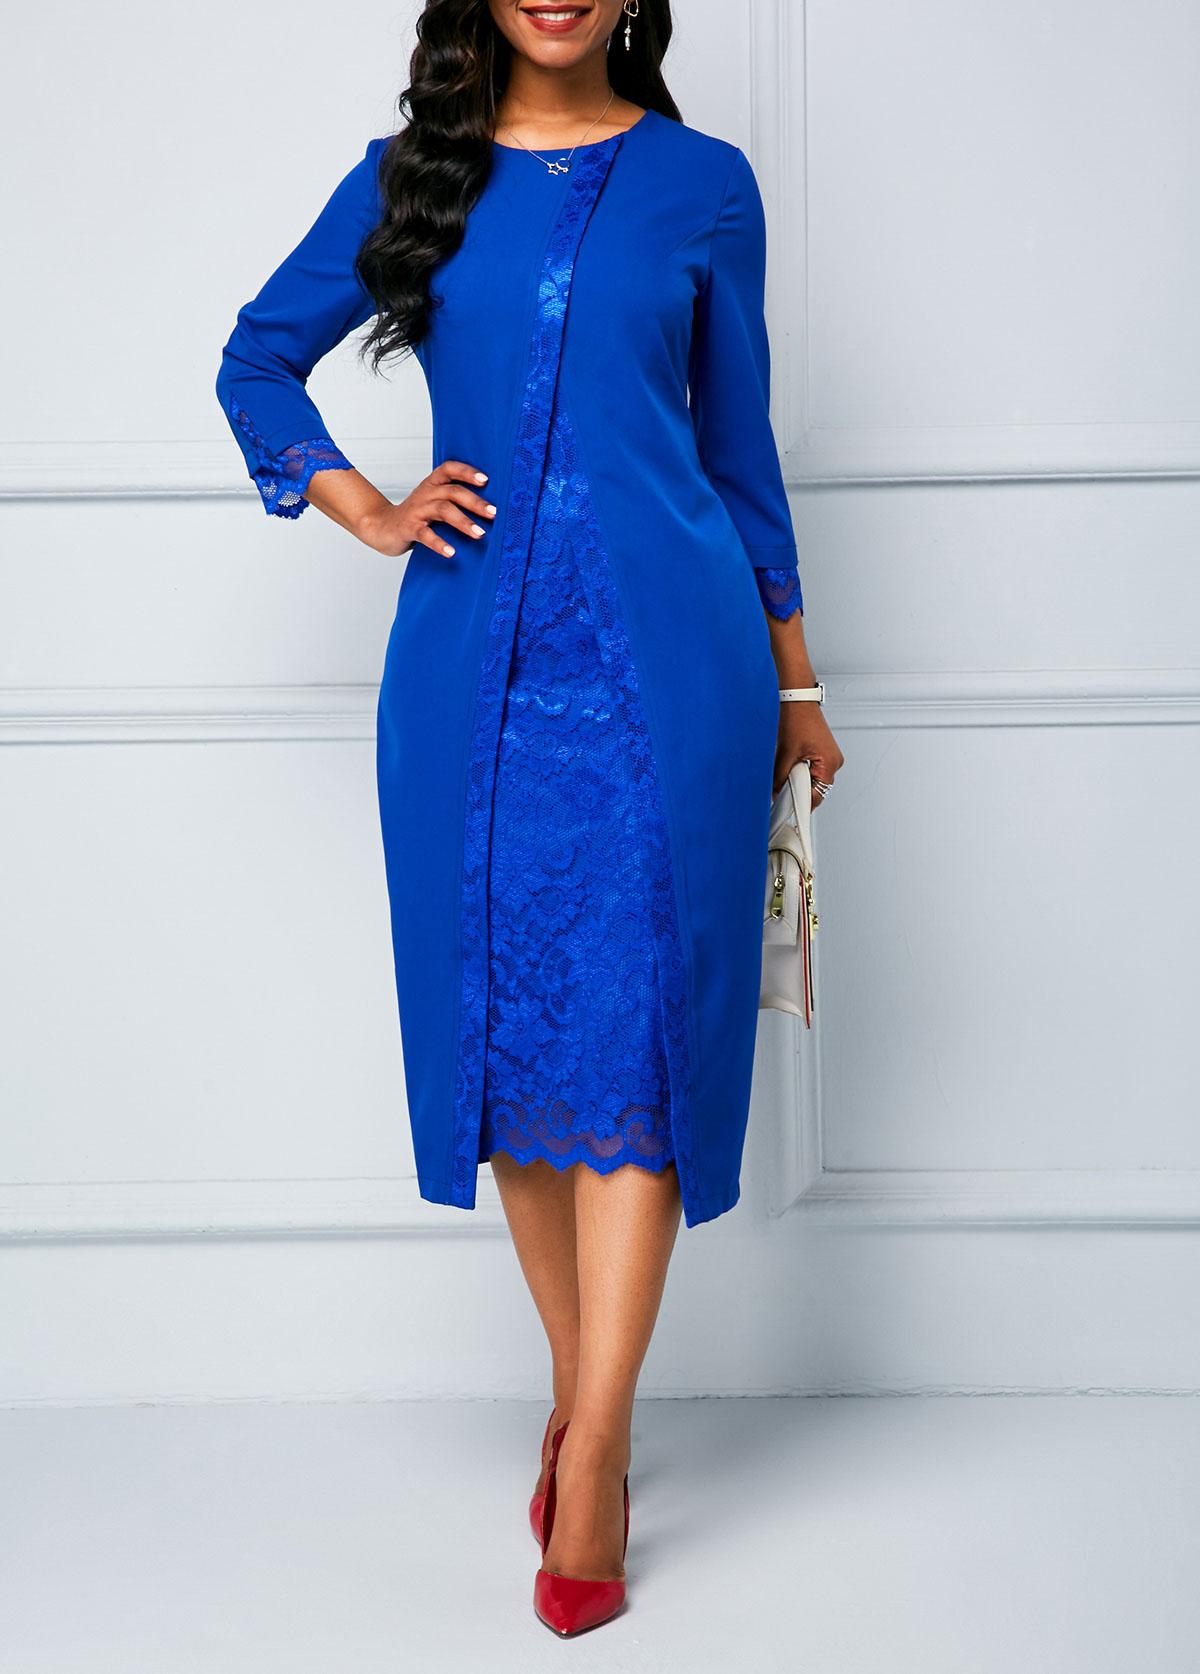 Lace Panel Long Sleeve Royal Blue Sheath Dress